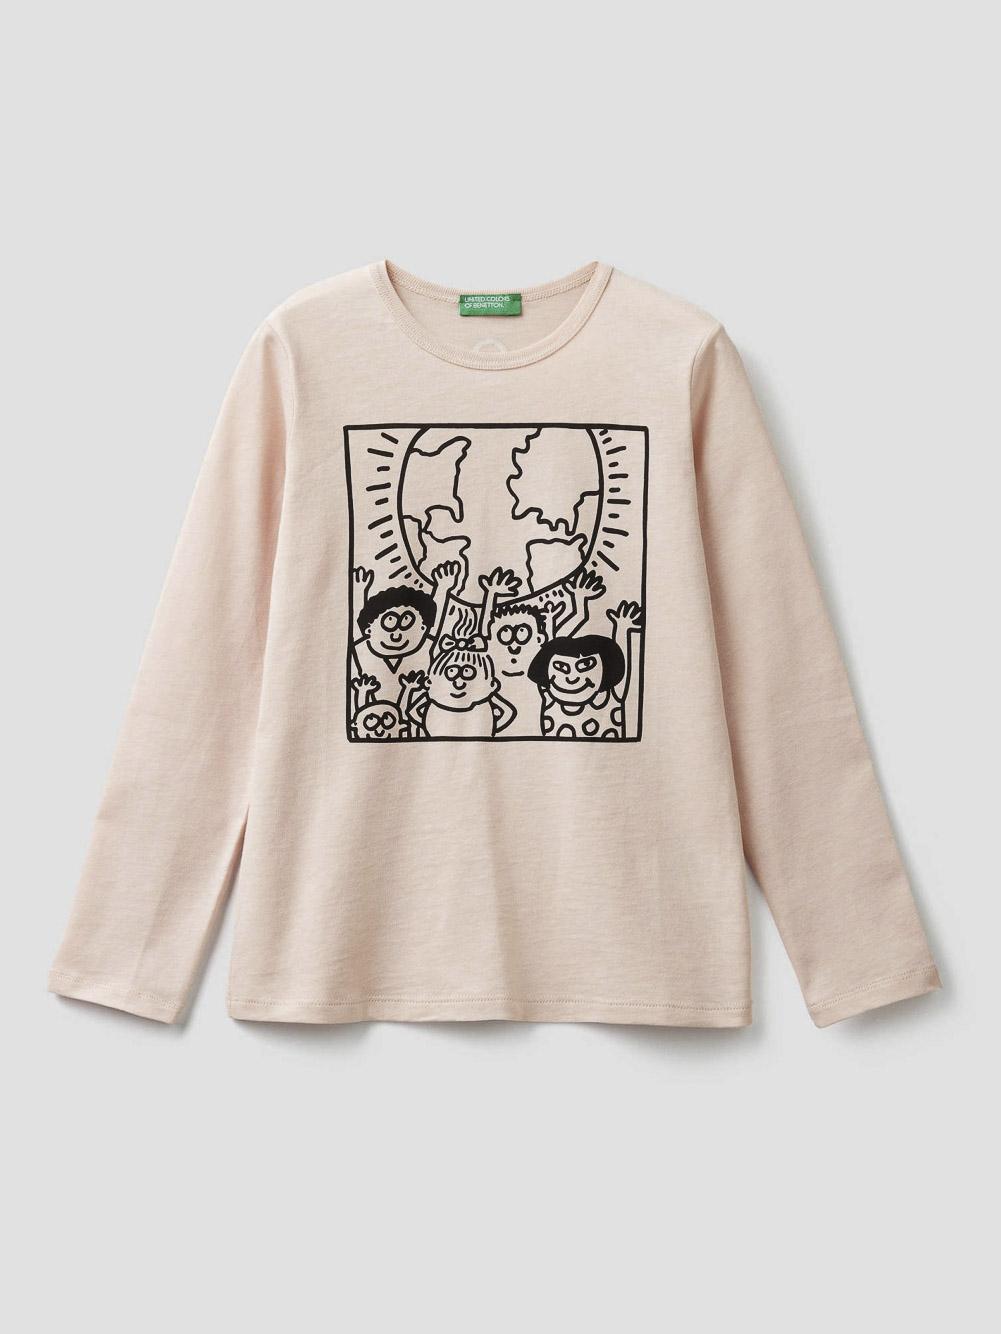 012 BENETTON T-shirt μακρυμάνικο Keit Haring 3096C14TS 20A04U